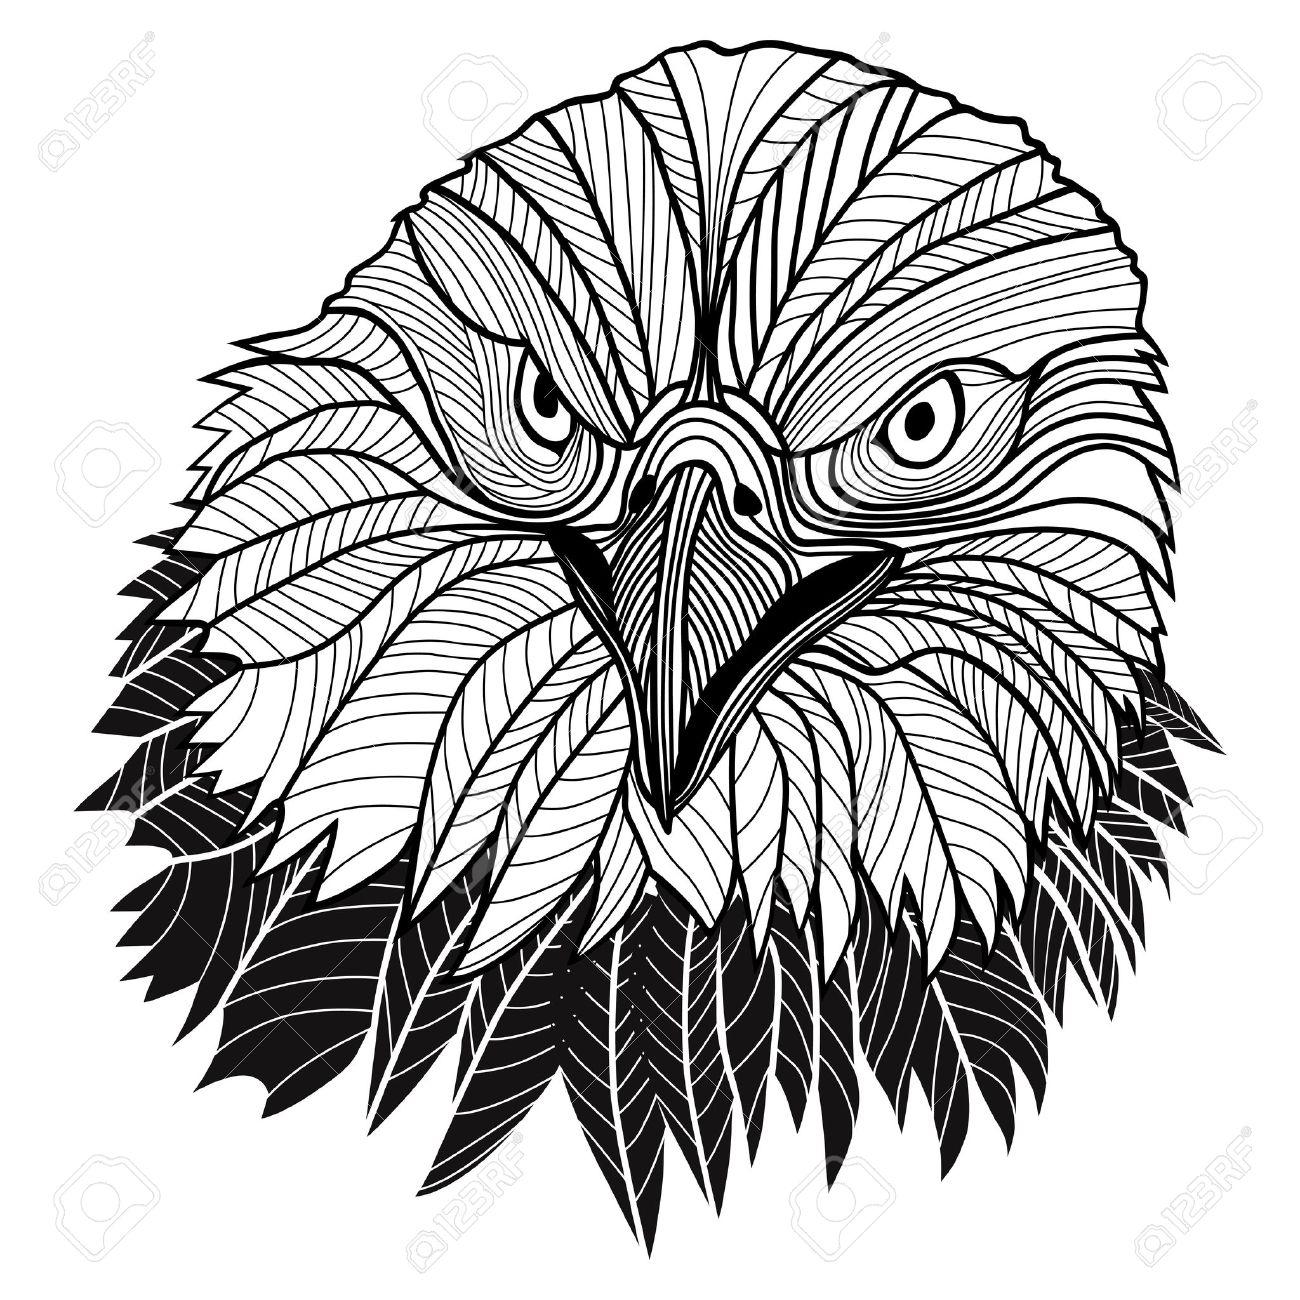 Bird bald eagle head as usa symbol for mascot or emblem design bird bald eagle head as usa symbol for mascot or emblem design logo vector illustration biocorpaavc Images